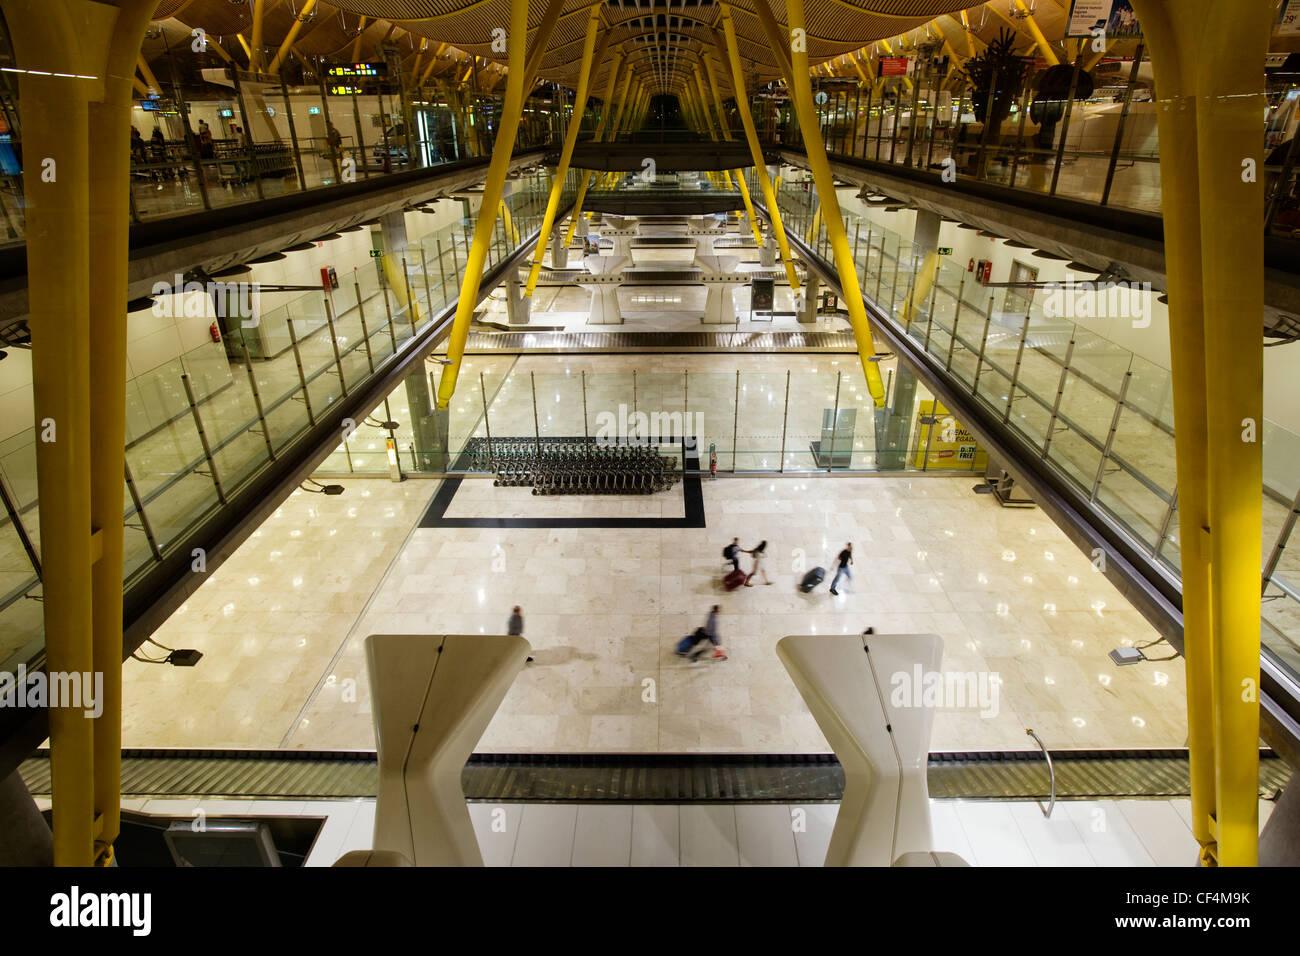 T4 Ankunftshalle Flughafen Madrid-Barajas, Spanien Stockbild